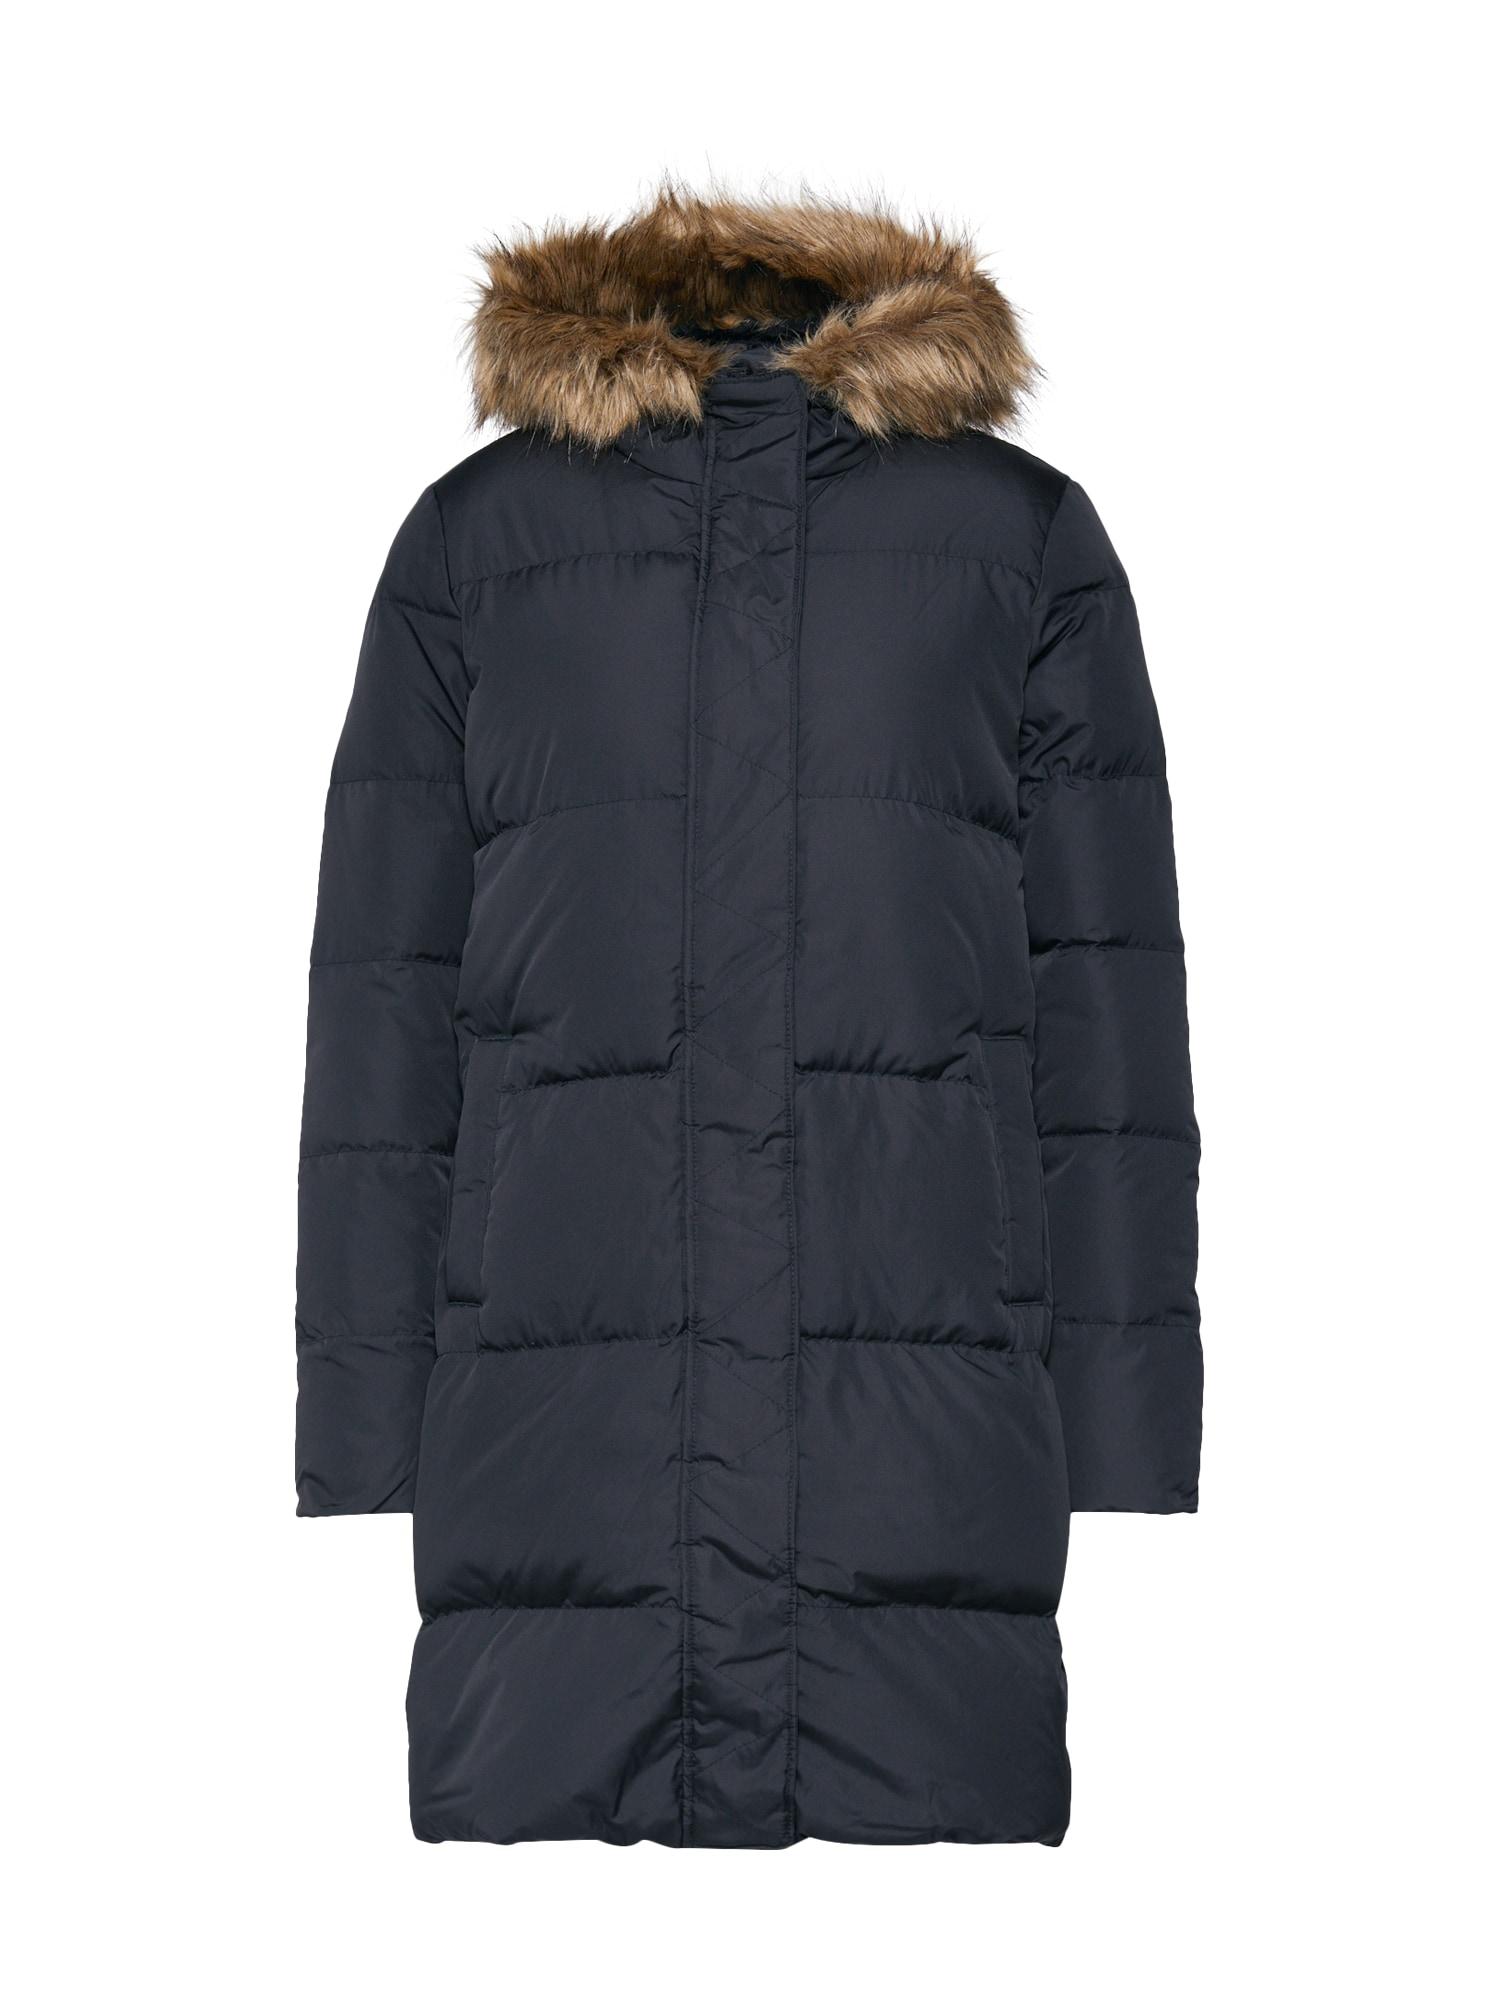 GAP Žieminis paltas 'V-LONG DOWN PUFFER' juoda